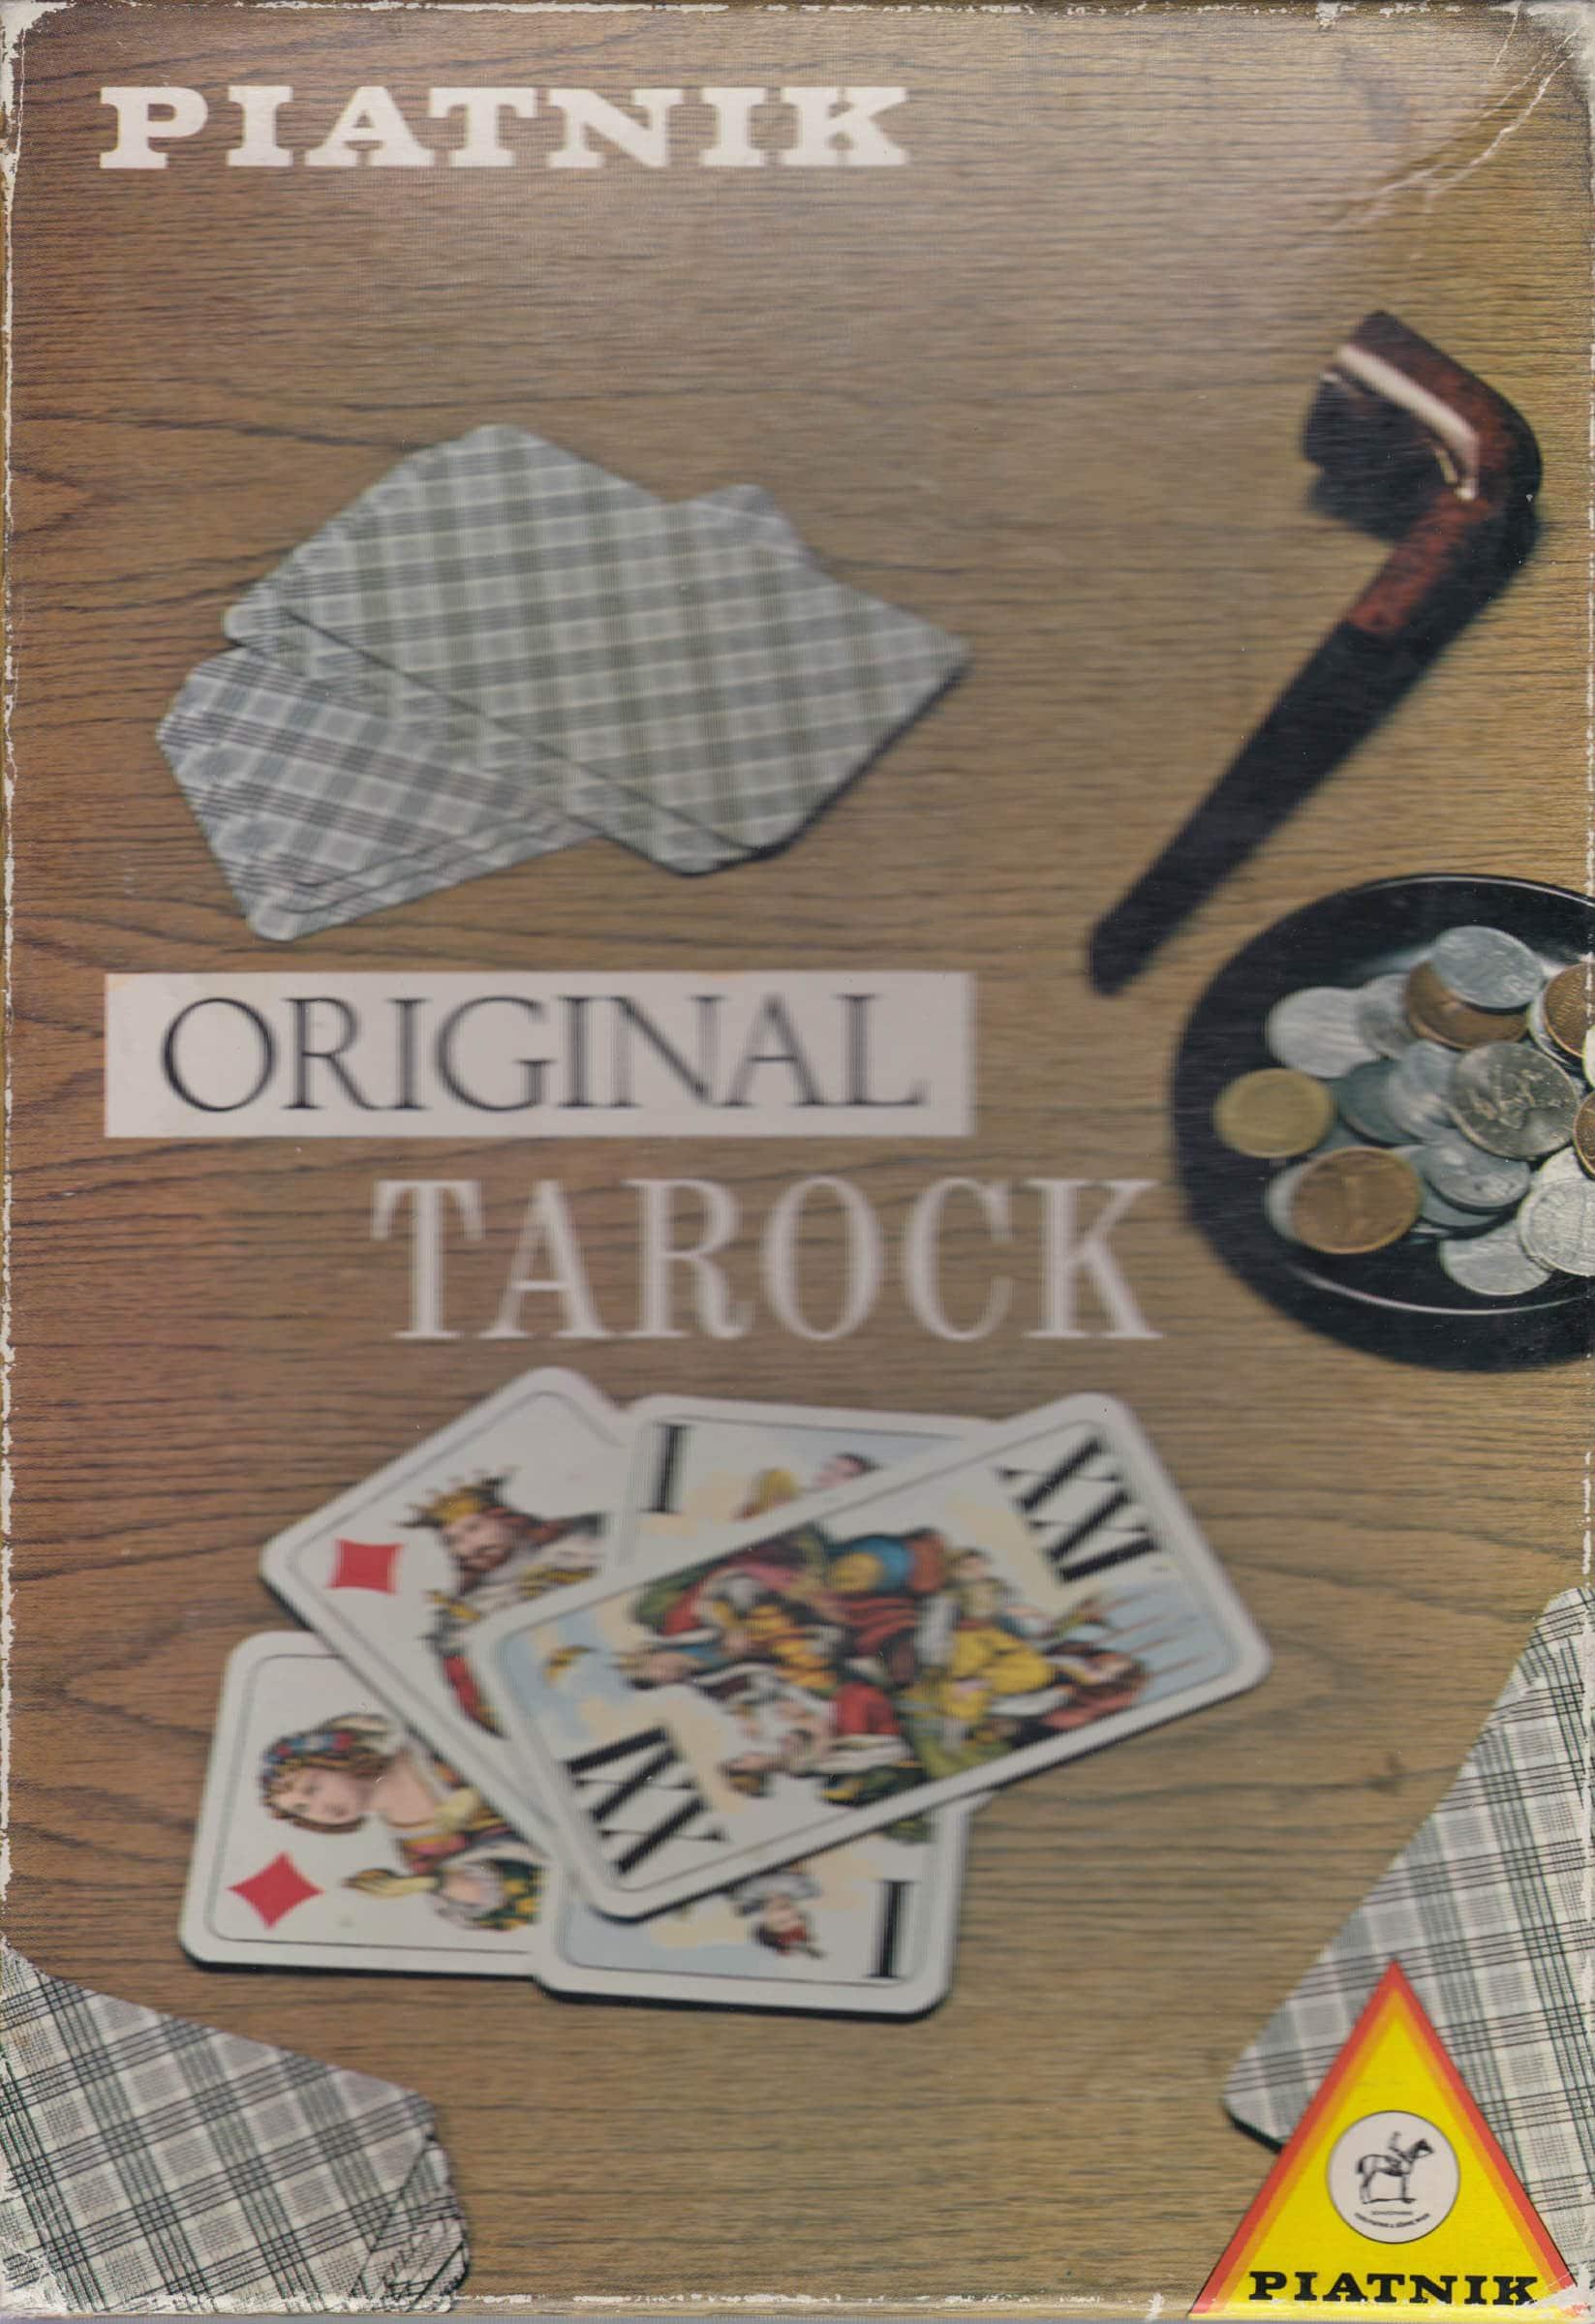 Piatnik Original Tarock